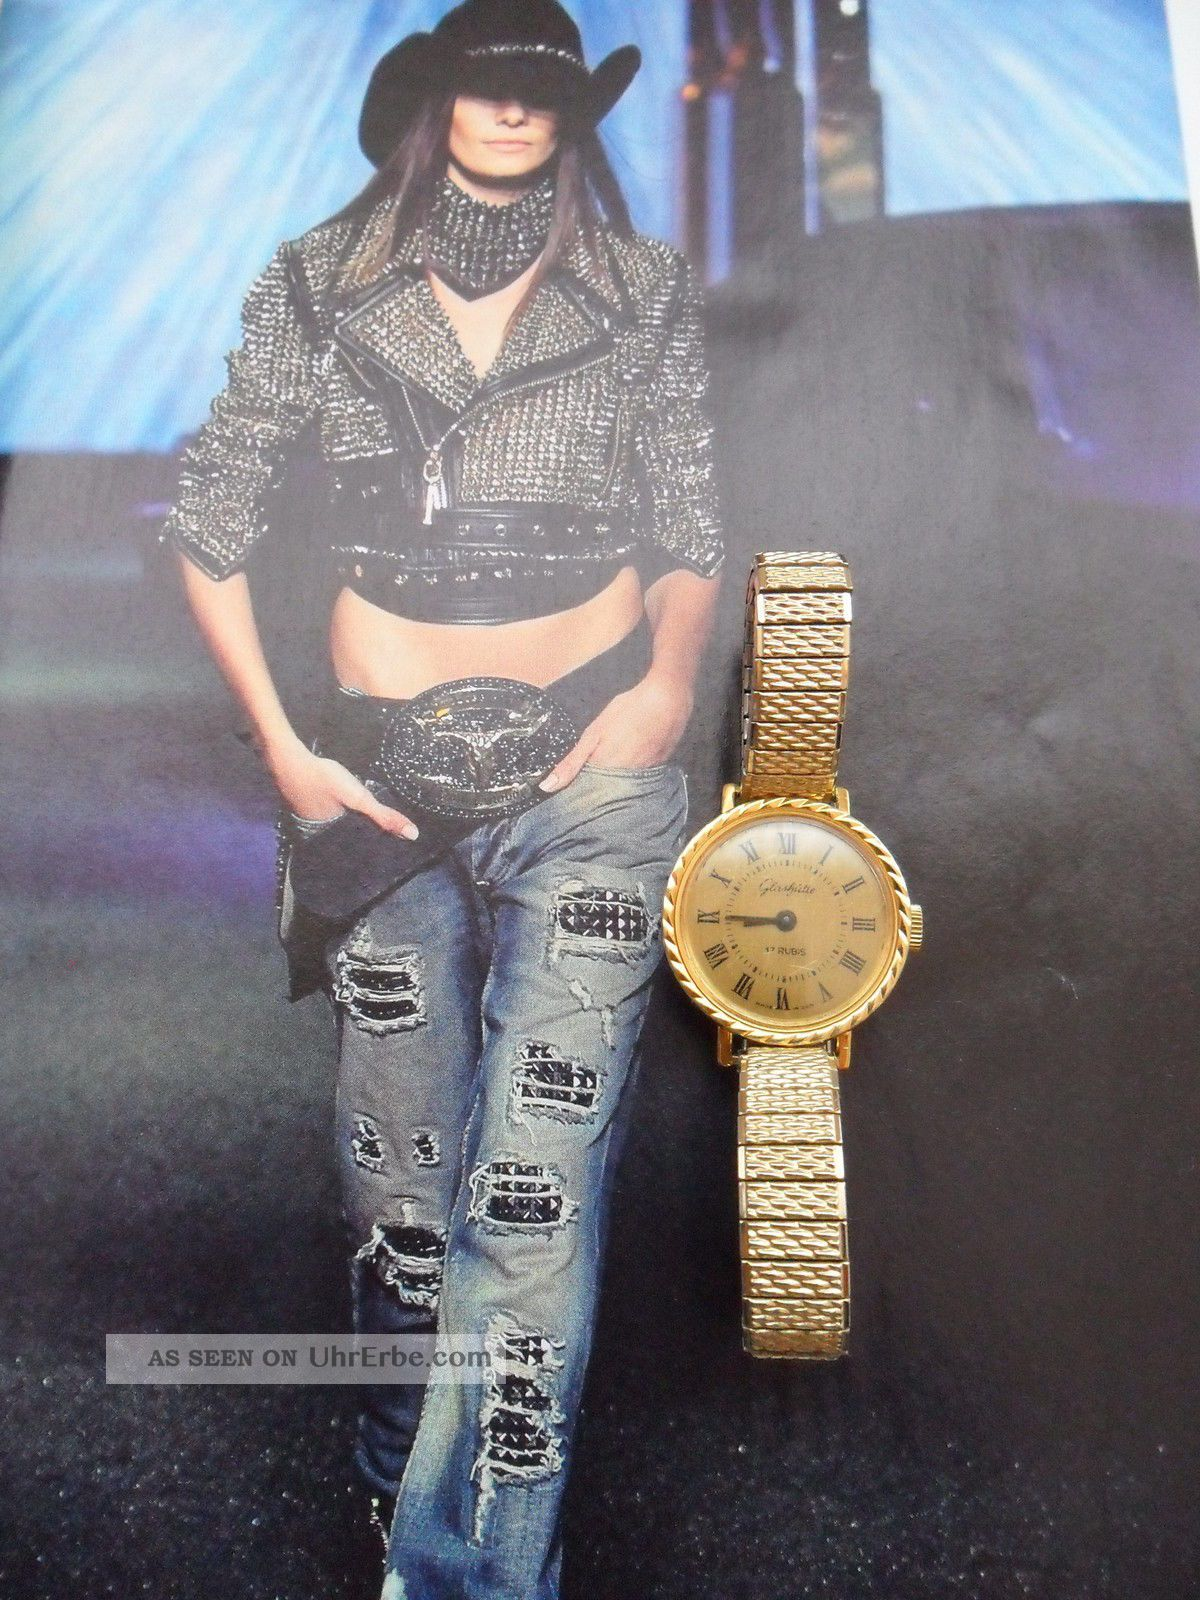 Luxus Hochwertige GlashÜtte Vergoldet 17 Rubis Made In Gdr Armbanduhren Bild